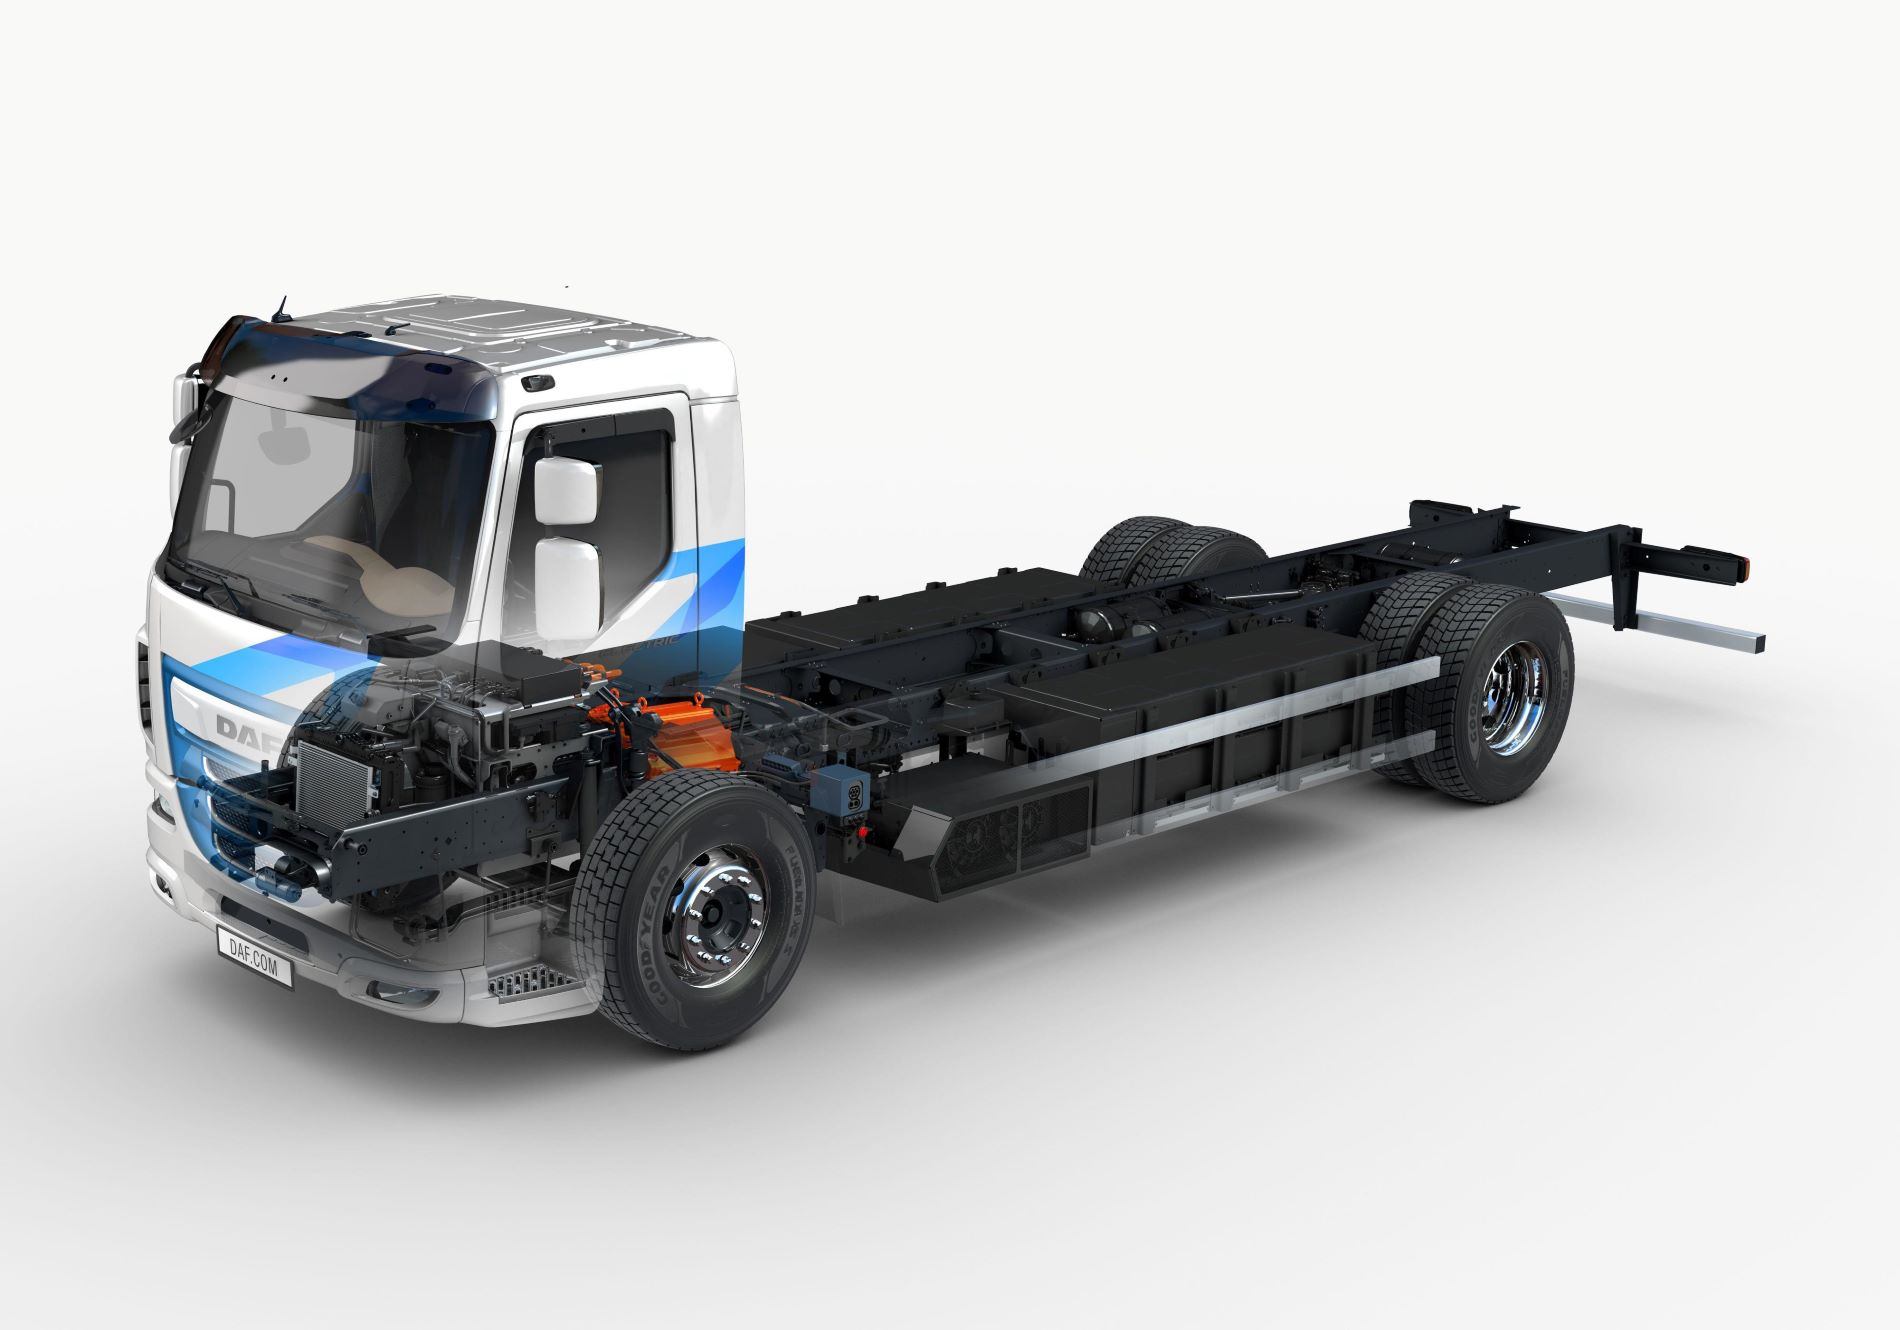 Daf Truck Lf View